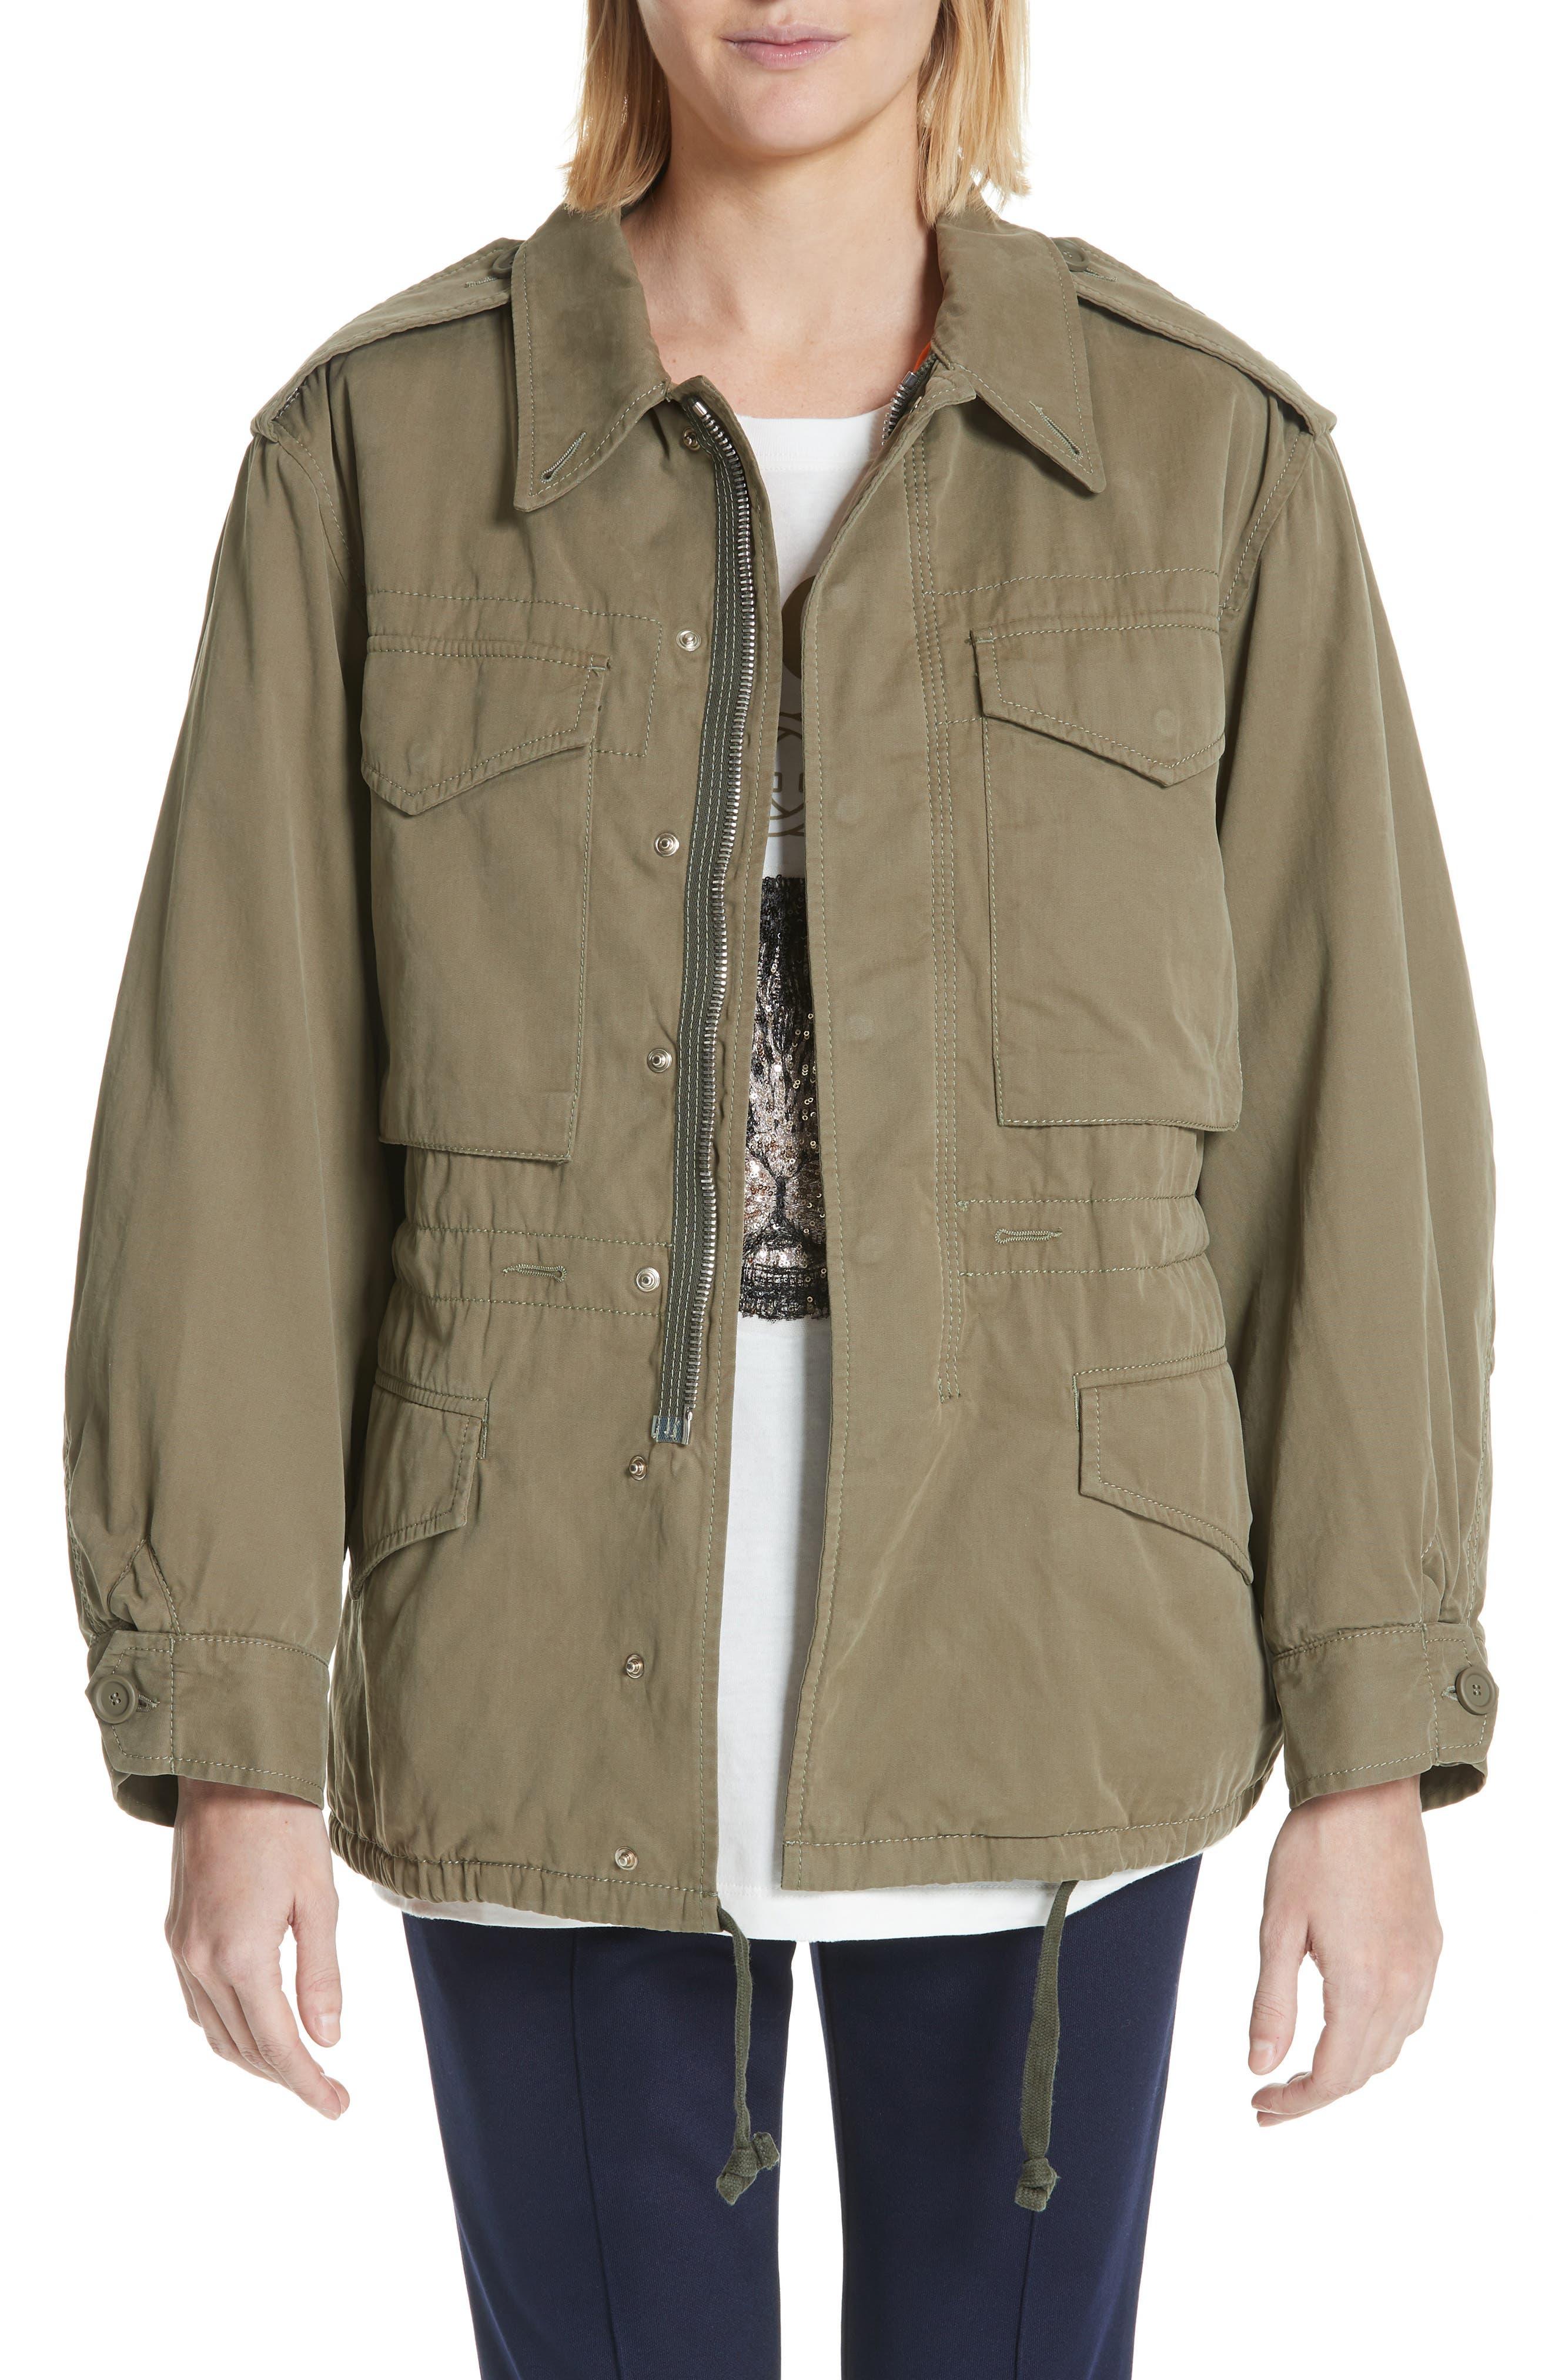 Gucci Logo Utility Jacket